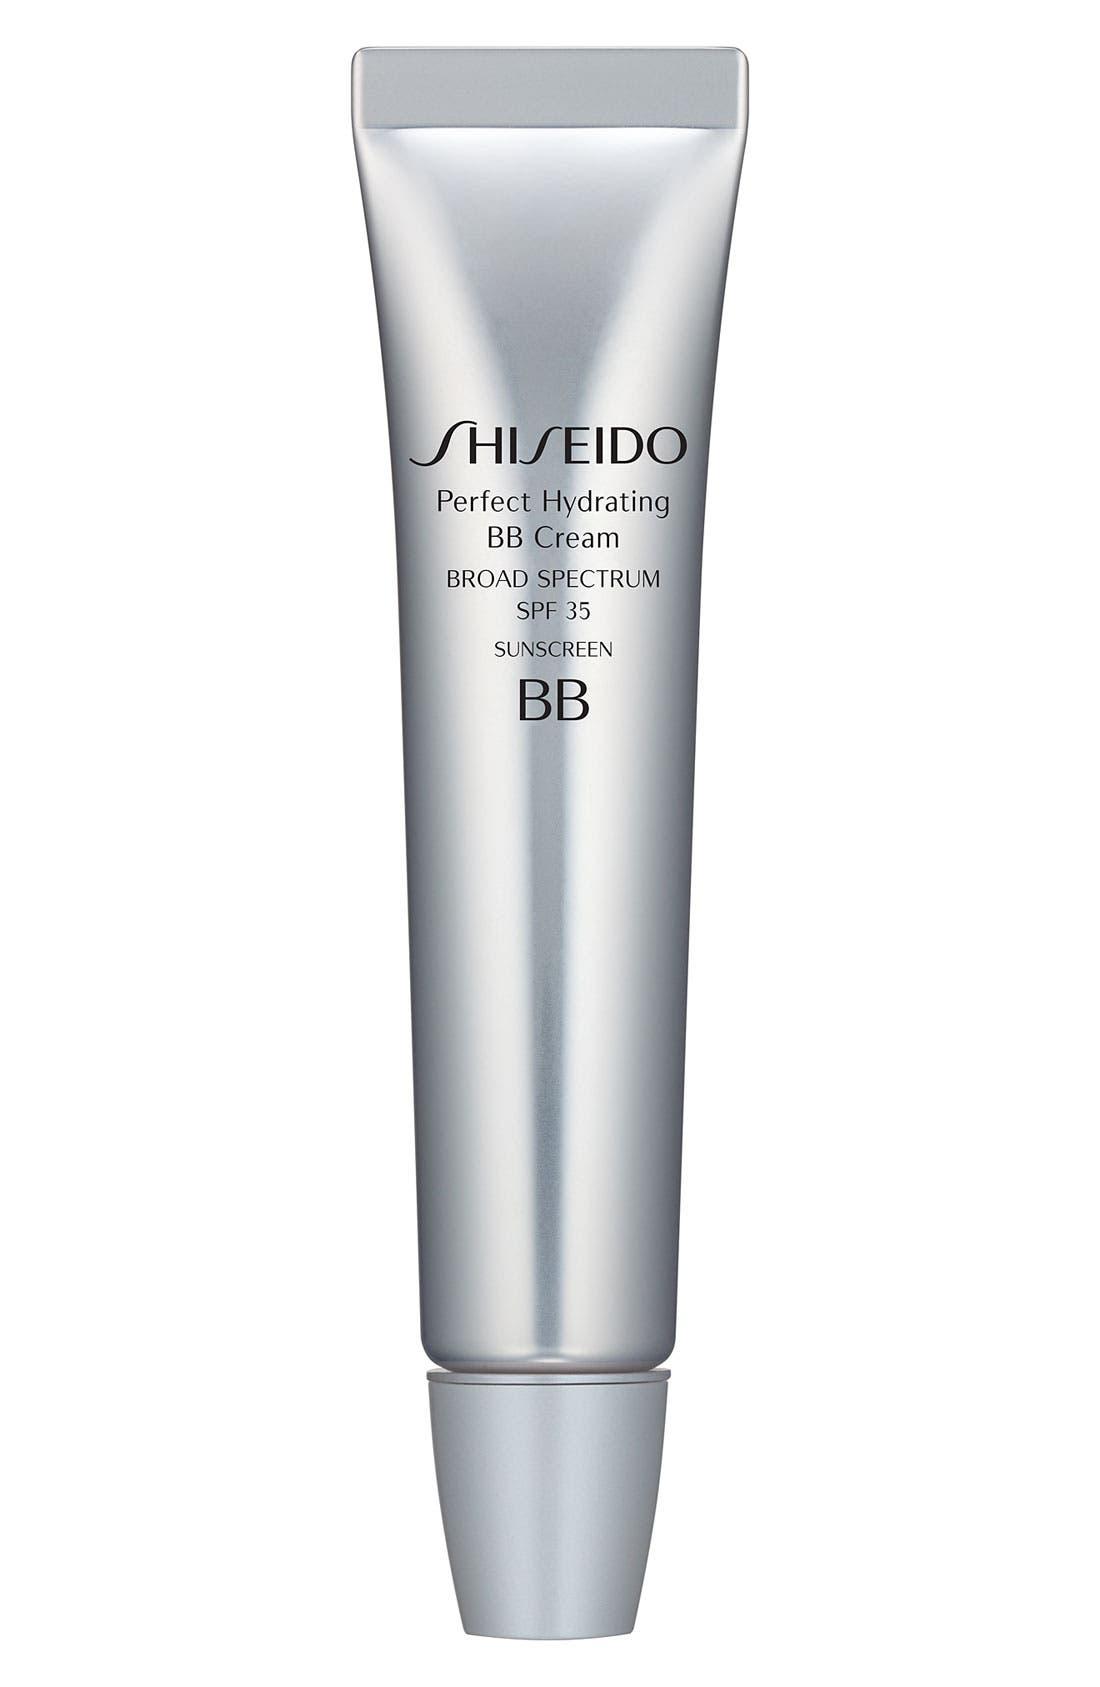 Shiseido 'Perfect' Hydrating BB Cream